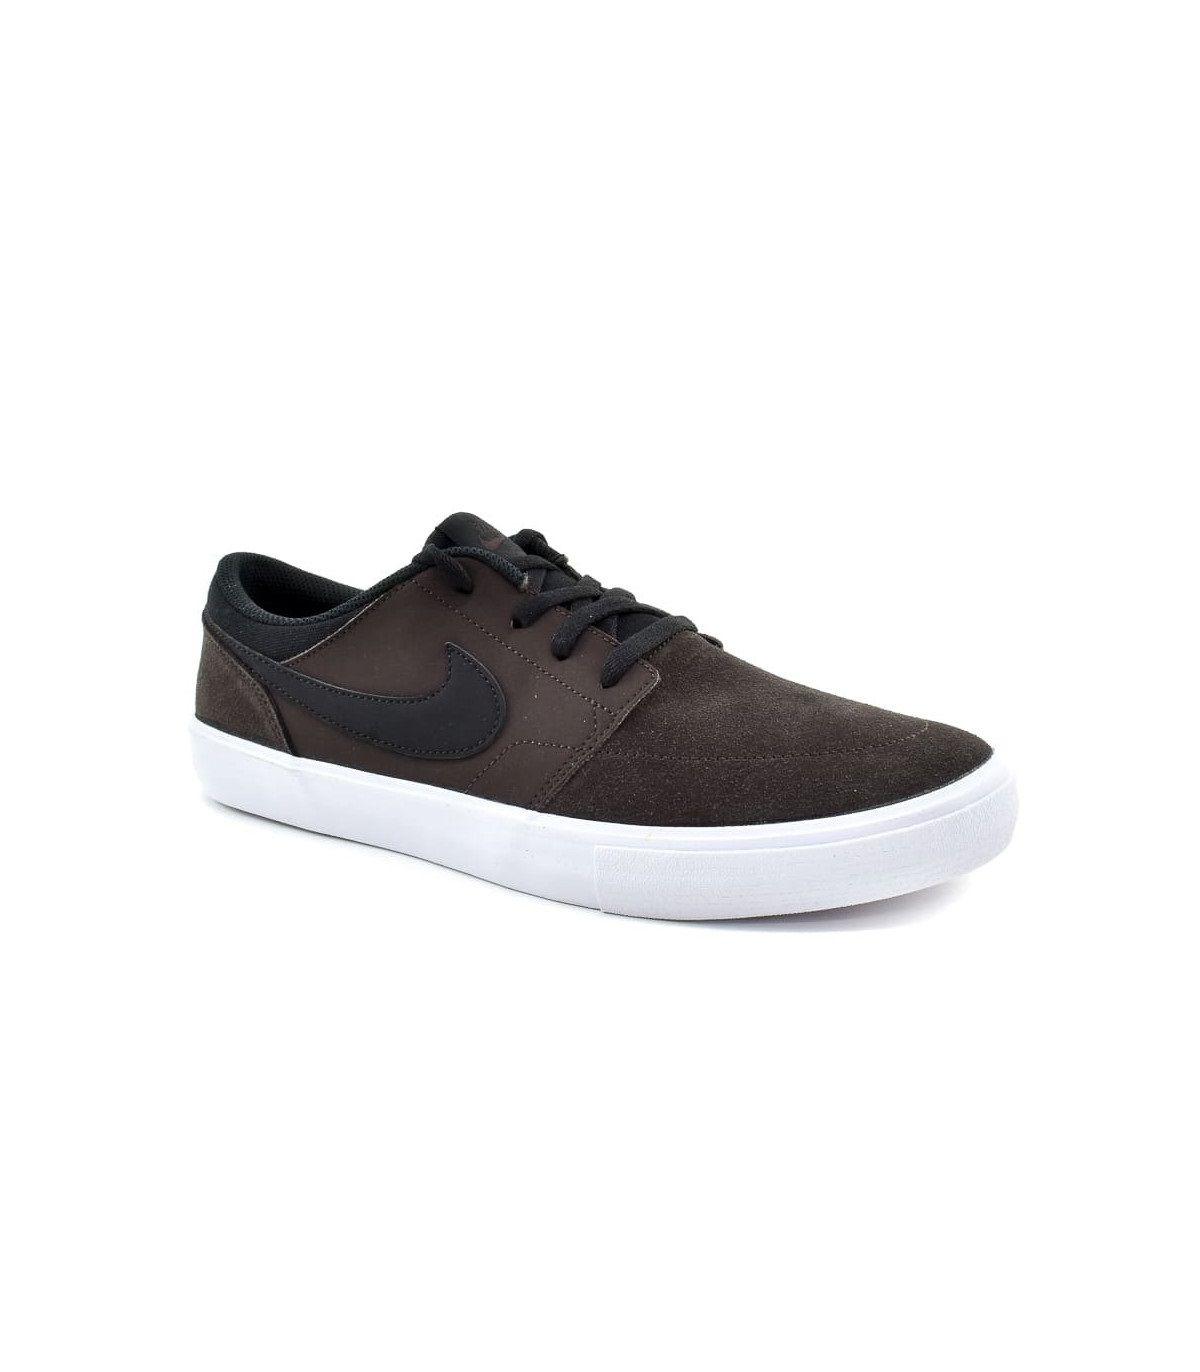 Tenis Nike Sb Portmore - 880266-203